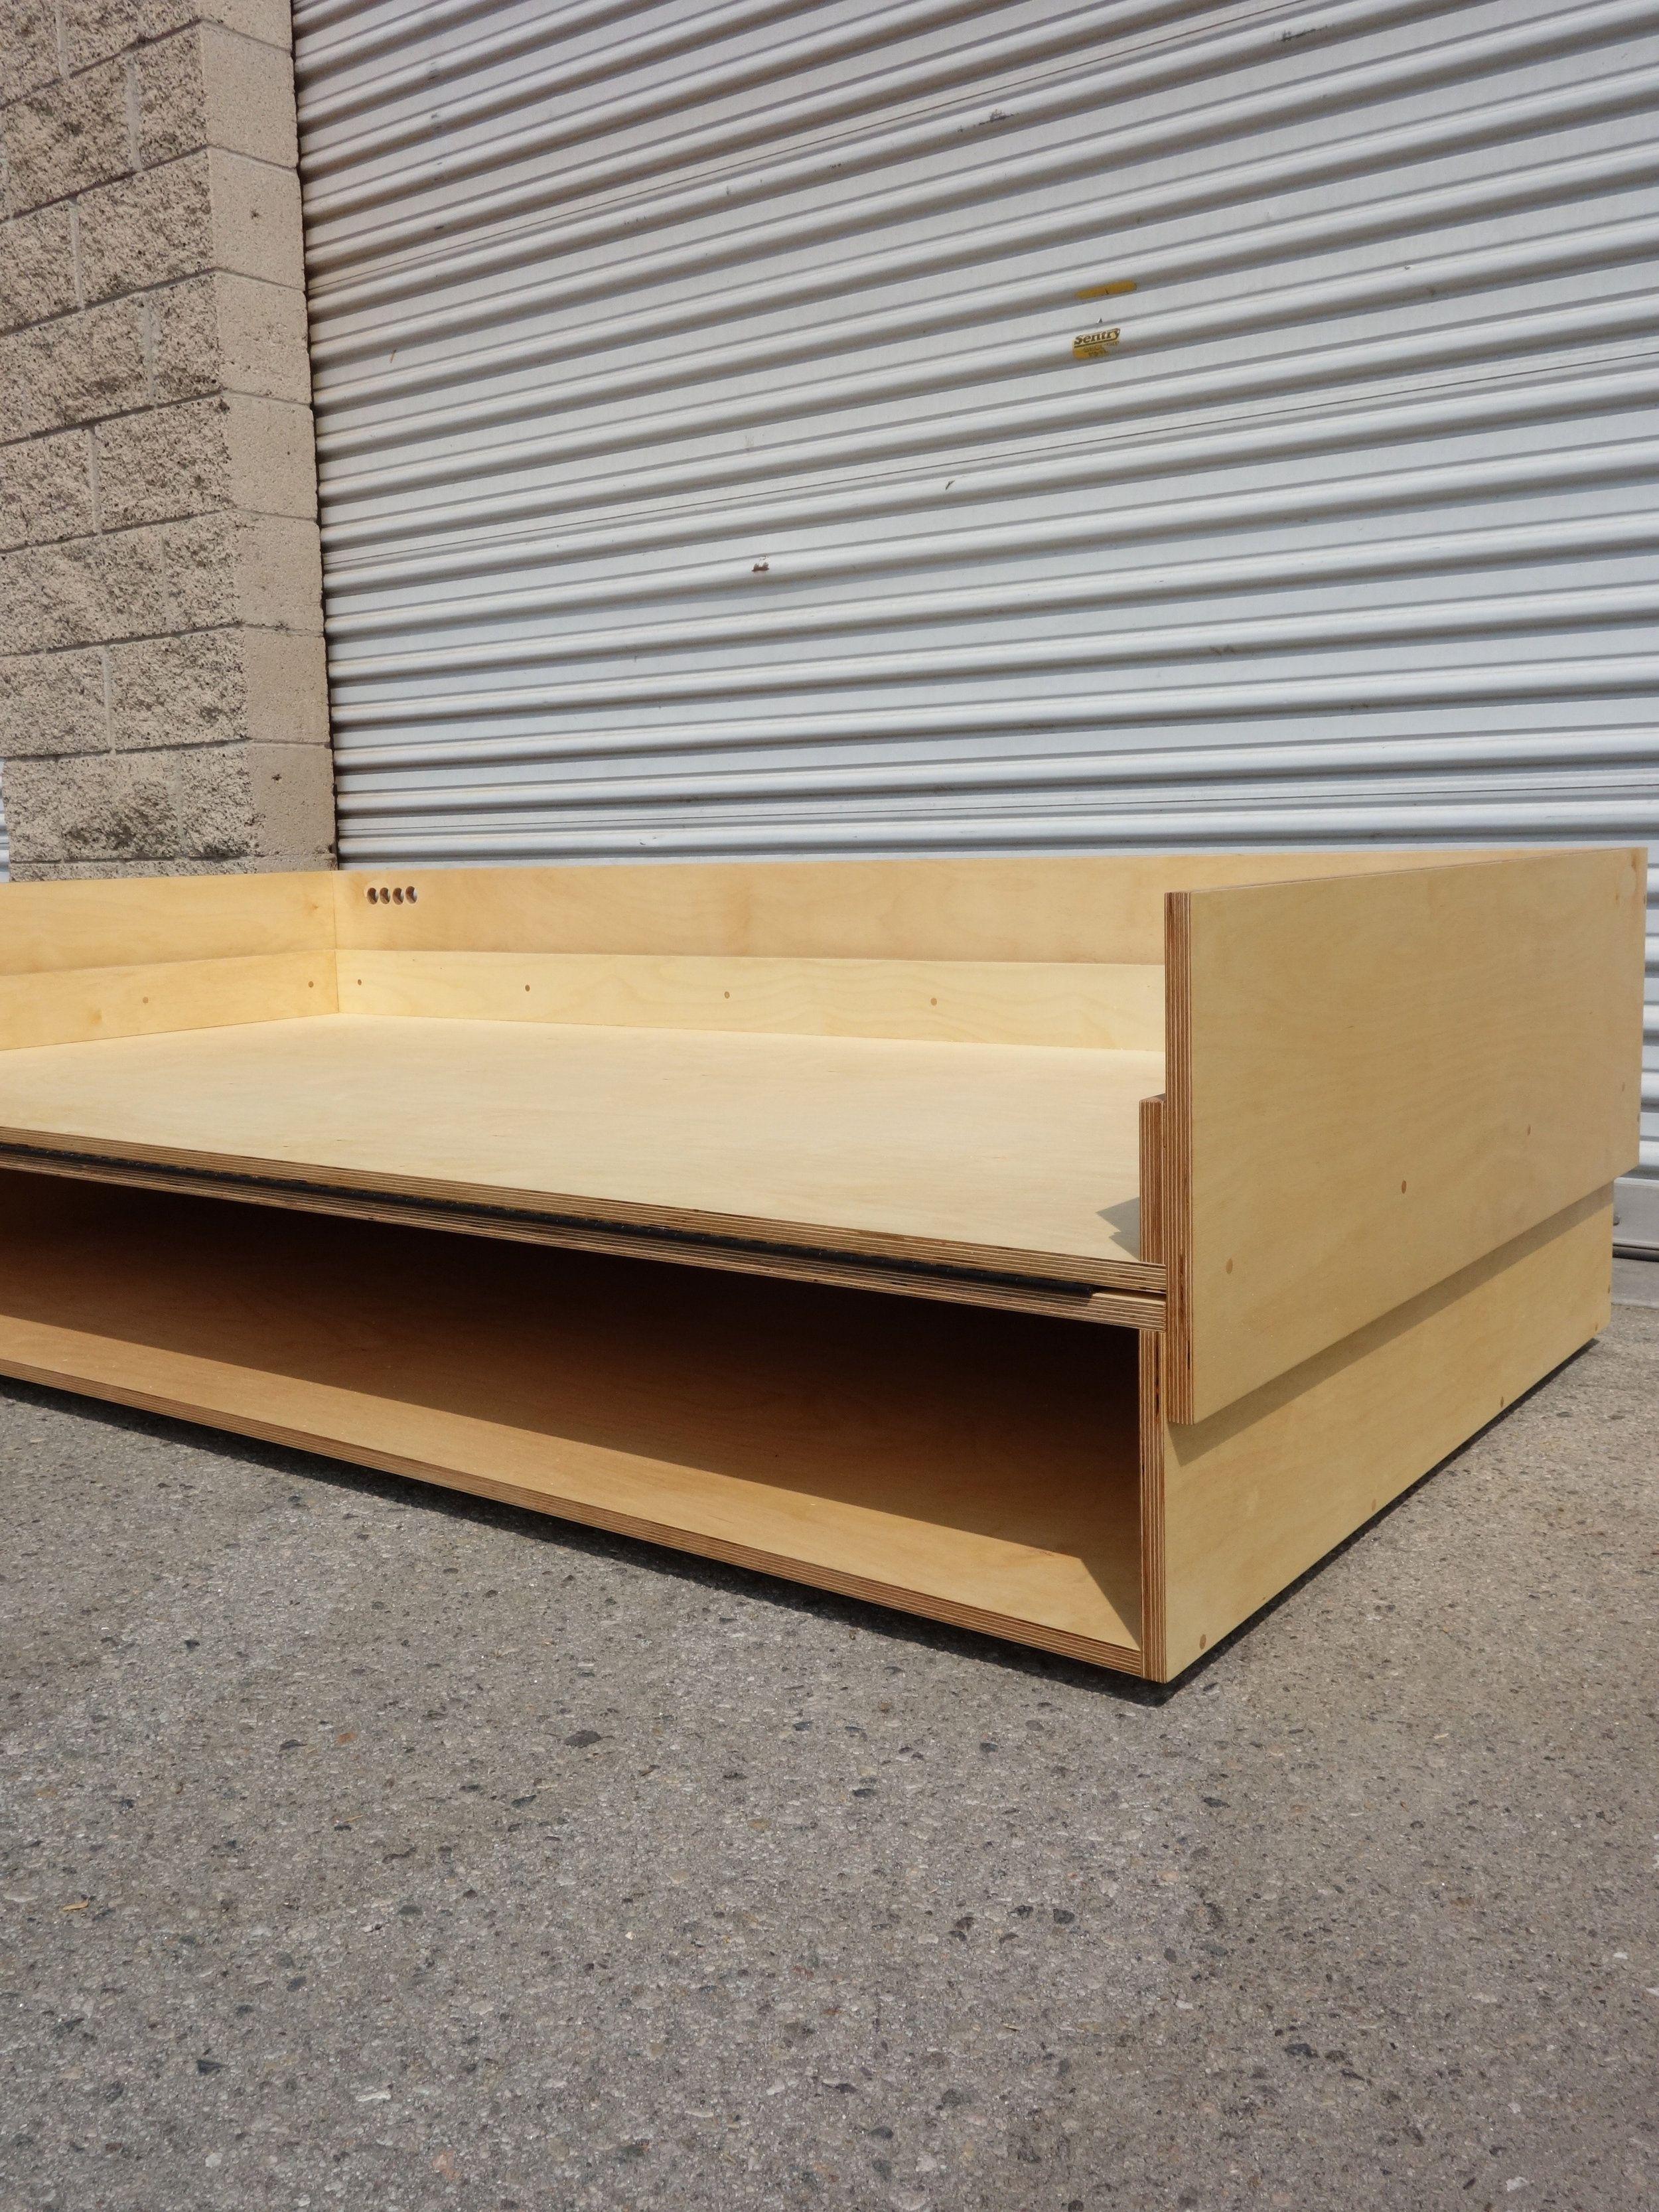 Folding Bed product image 1